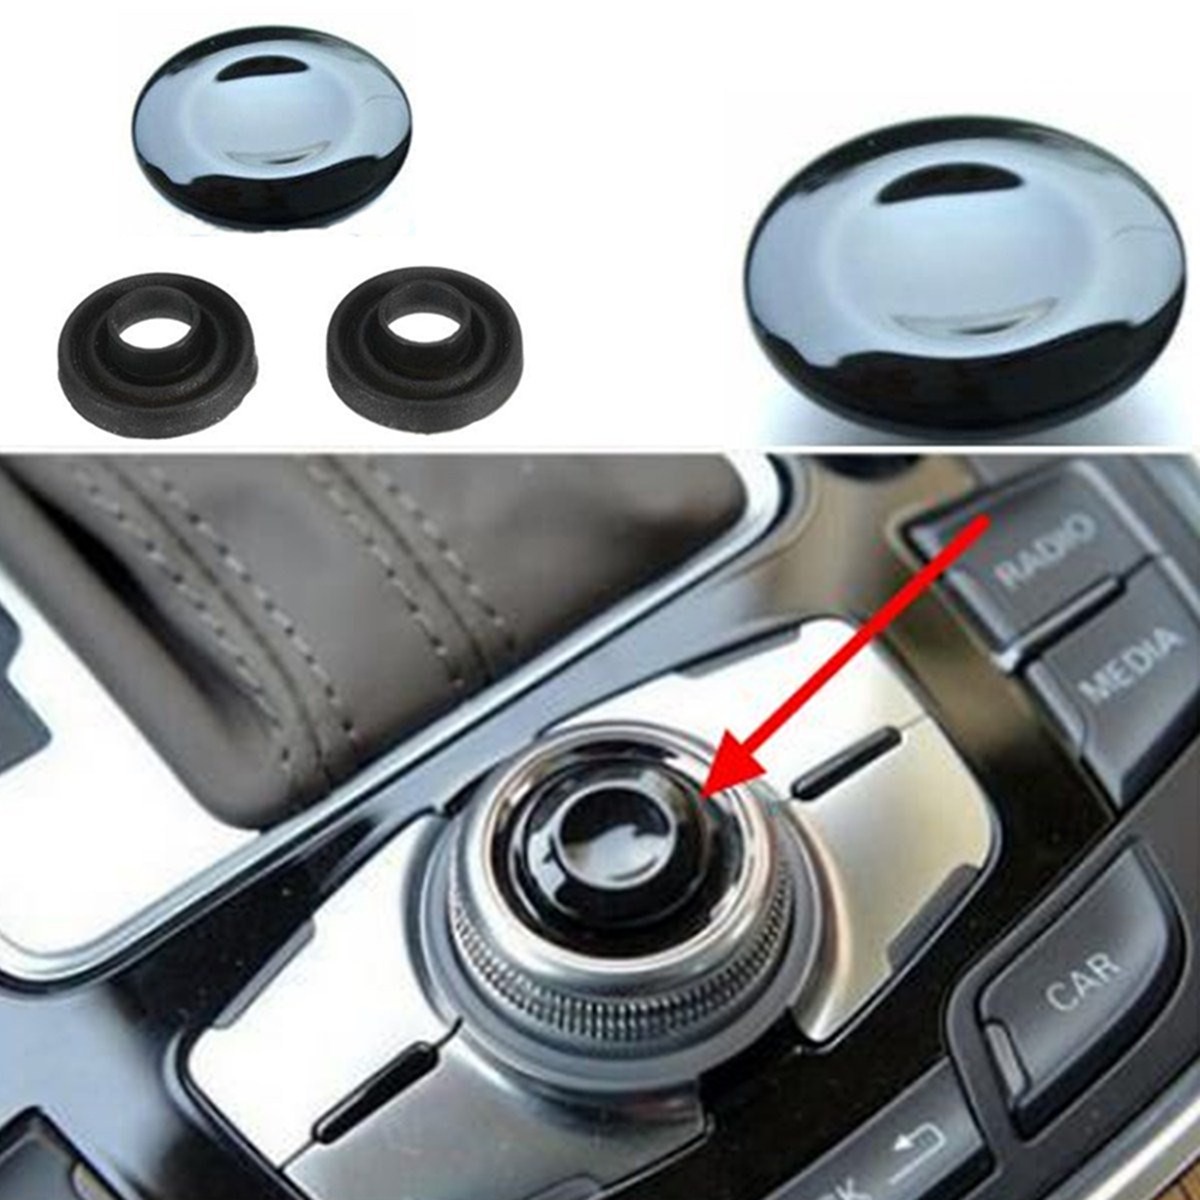 MMI Ручка Джойстик Кнопка крышка Ремонтный комплект для Audi A4 A5 A6 Q5 Q7 S5 S6 S8 Cabriolet седан Avant 8K0998068 A